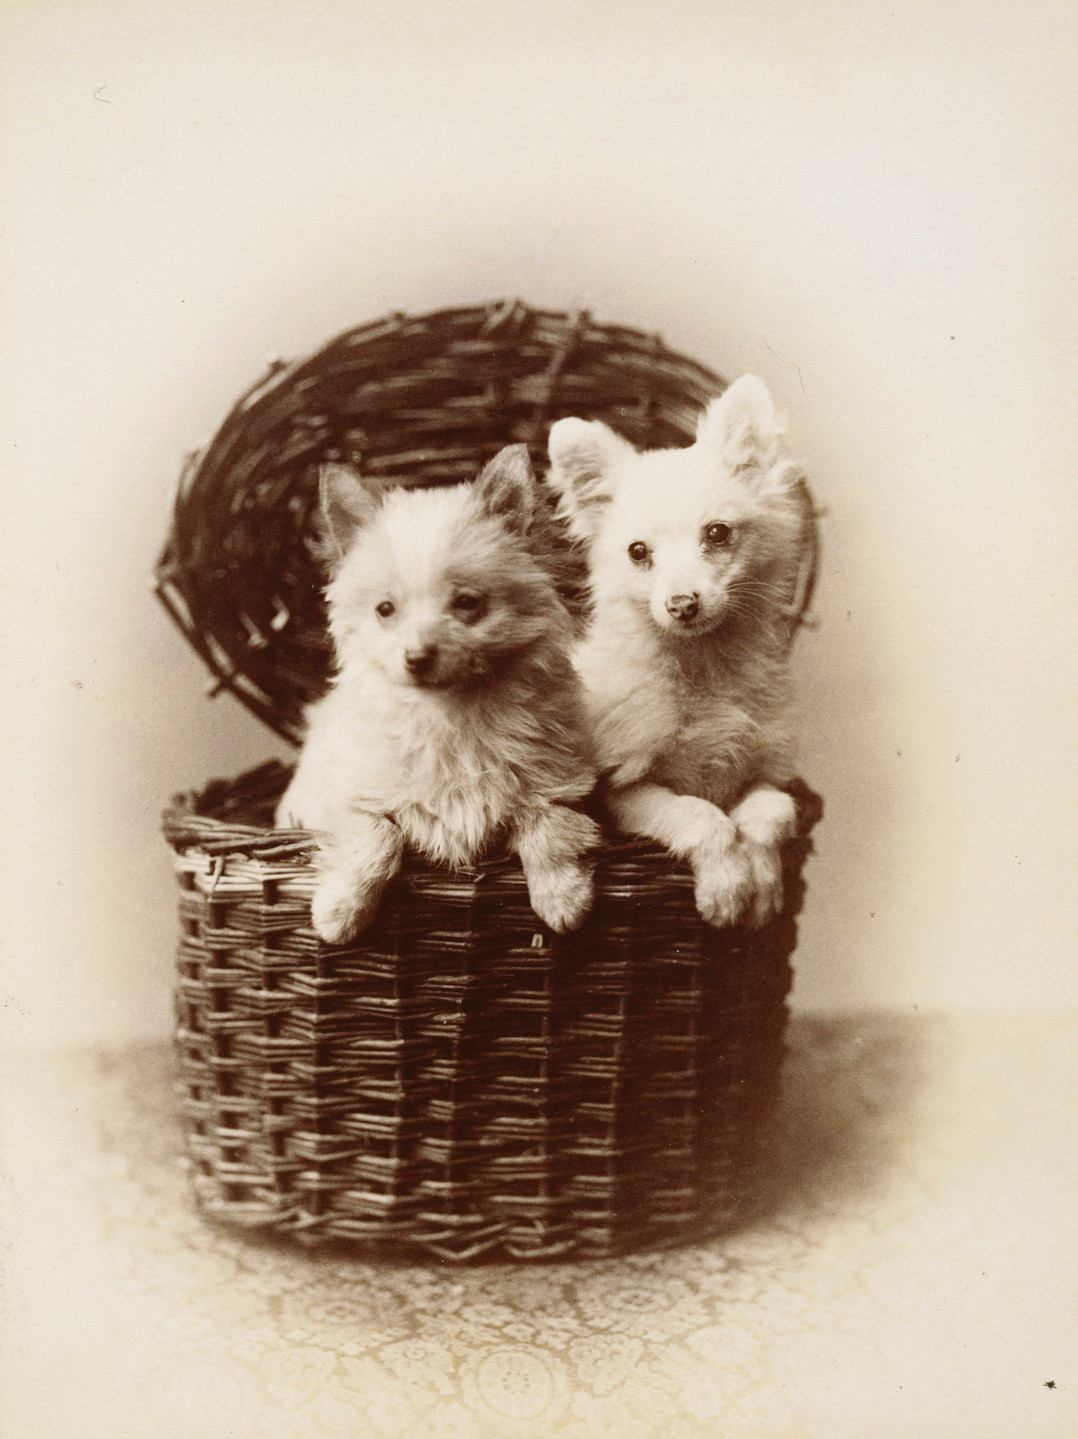 Pommeranians Lina & Beppo 1888. Dogs belonging to Queen Victoria